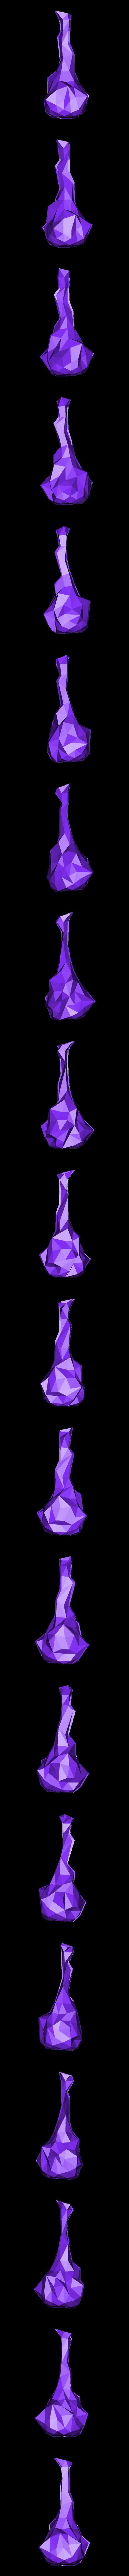 common_random_vase.stl Download free STL file Common Random Vase • Design to 3D print, IDEABOX